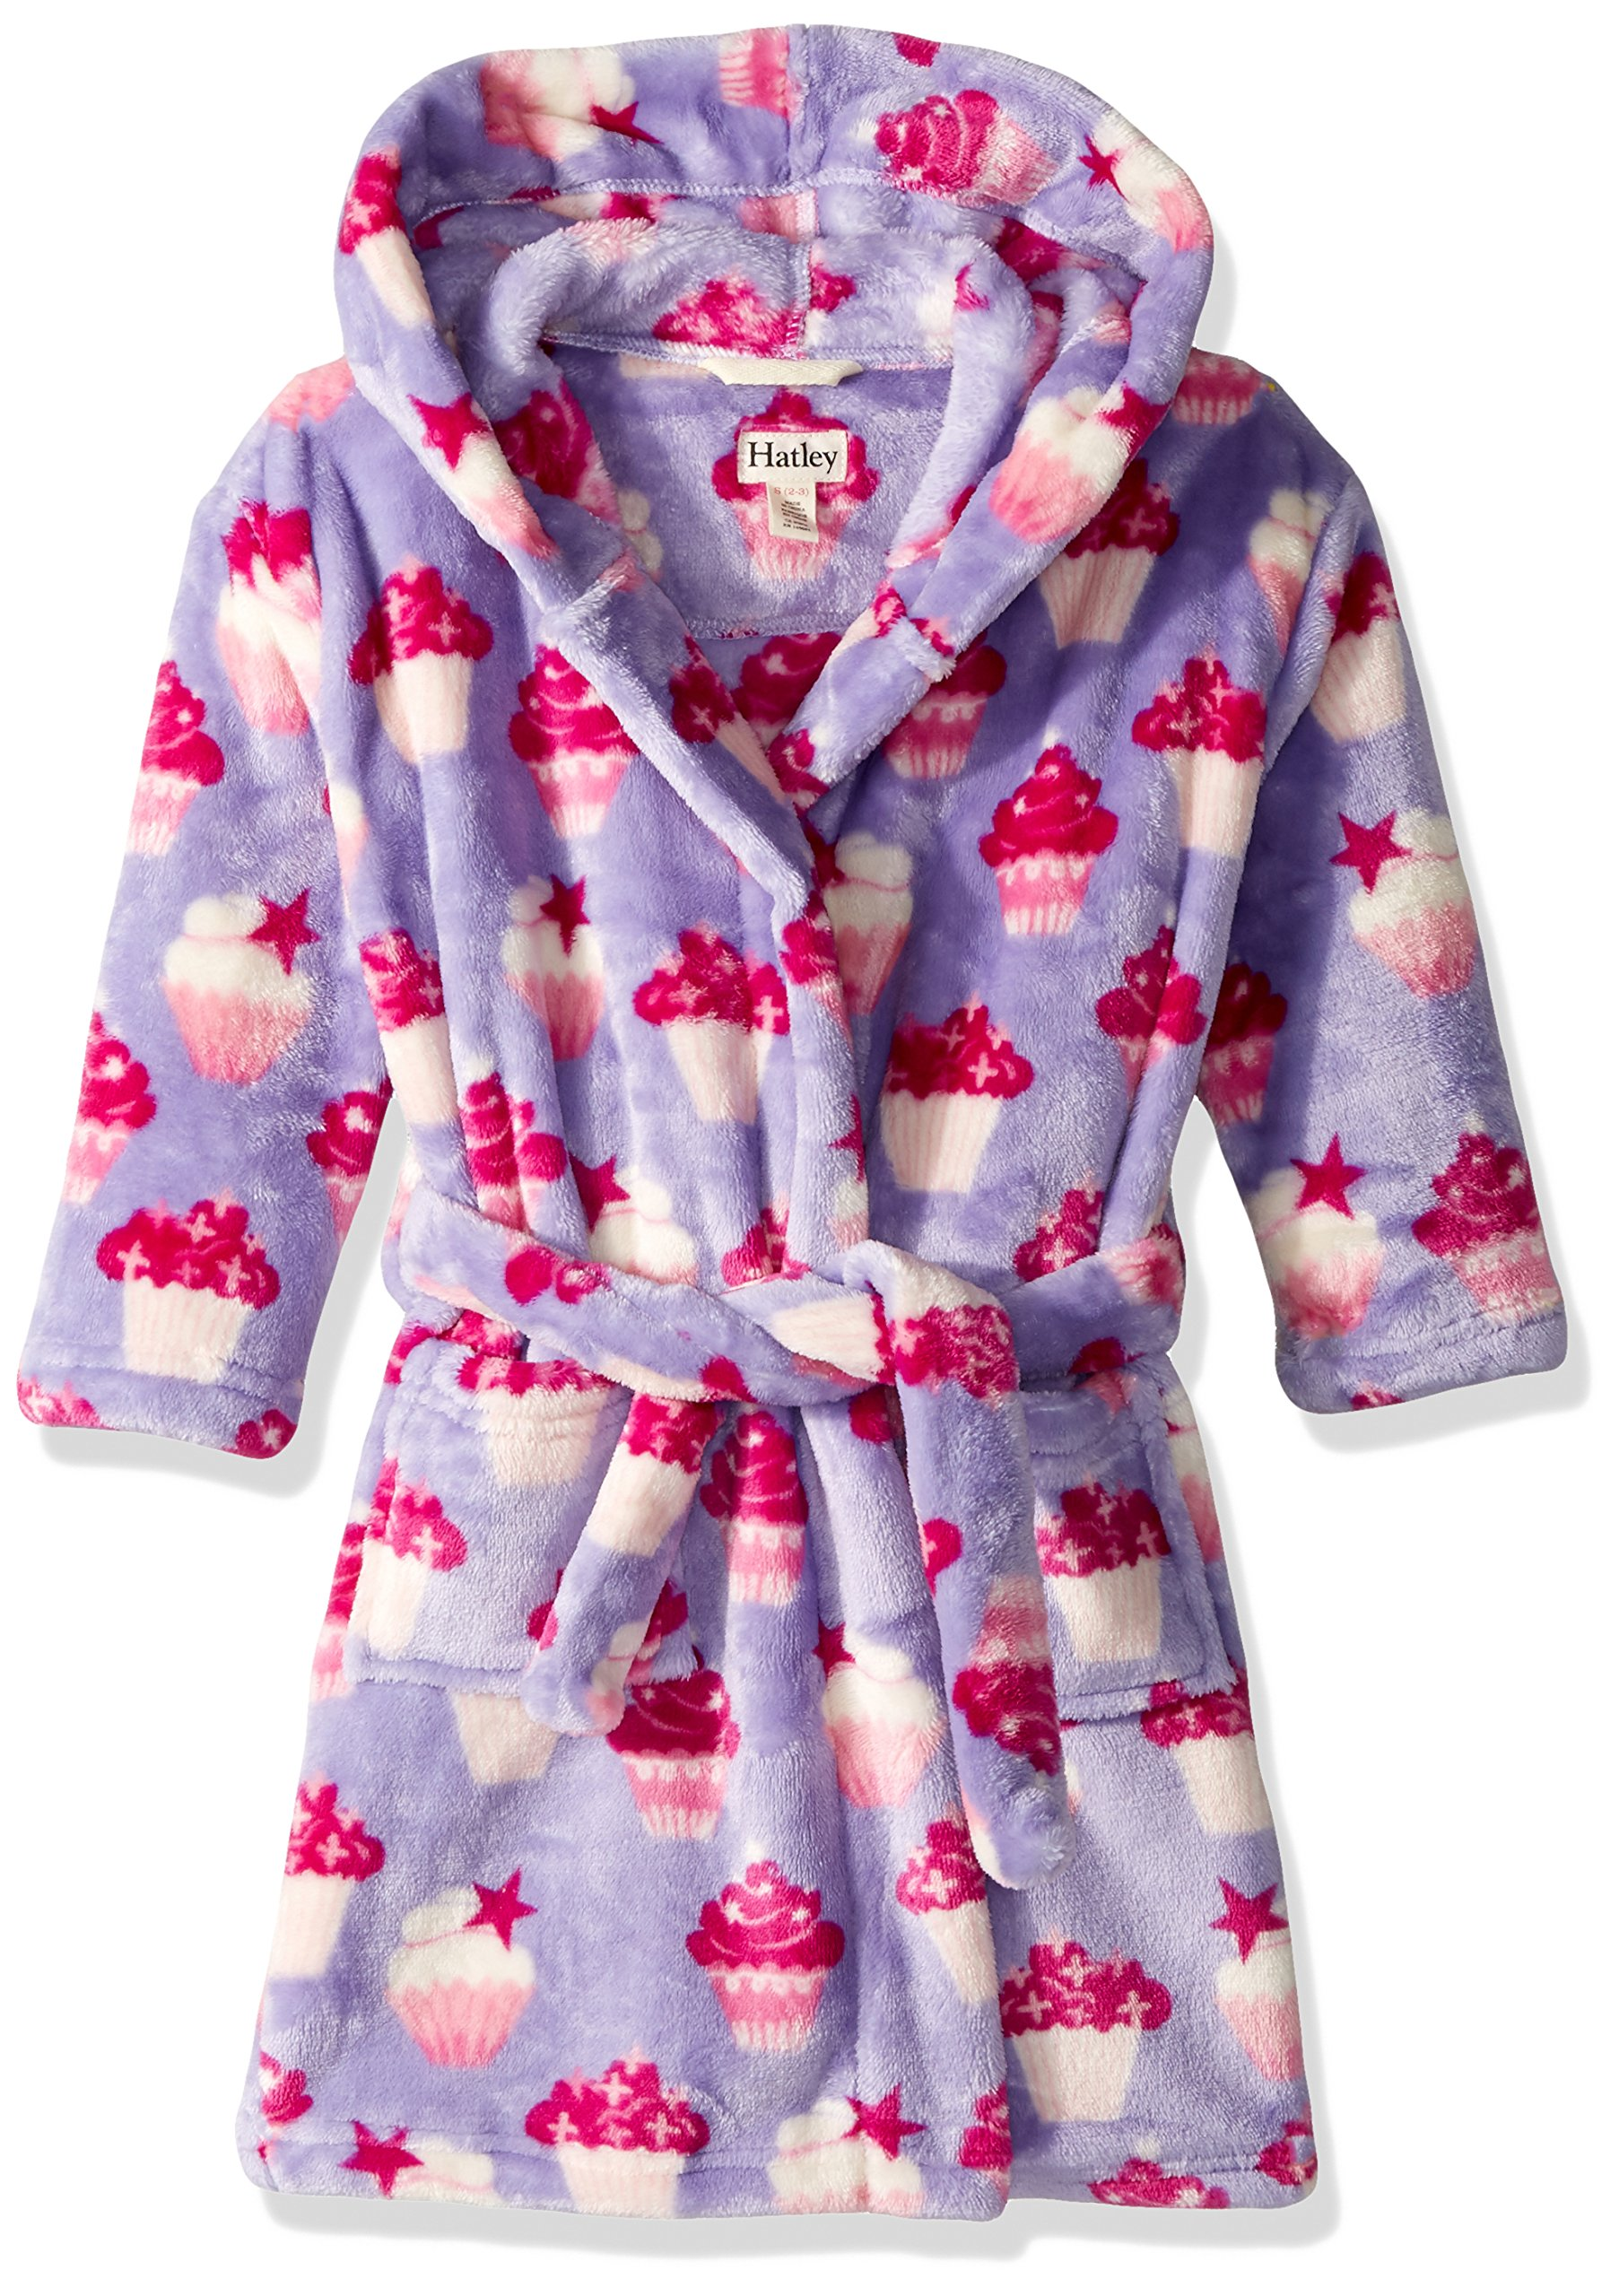 Hatley Girls' Little Fuzzy Fleece Robes, Yummy Cupcakes Small